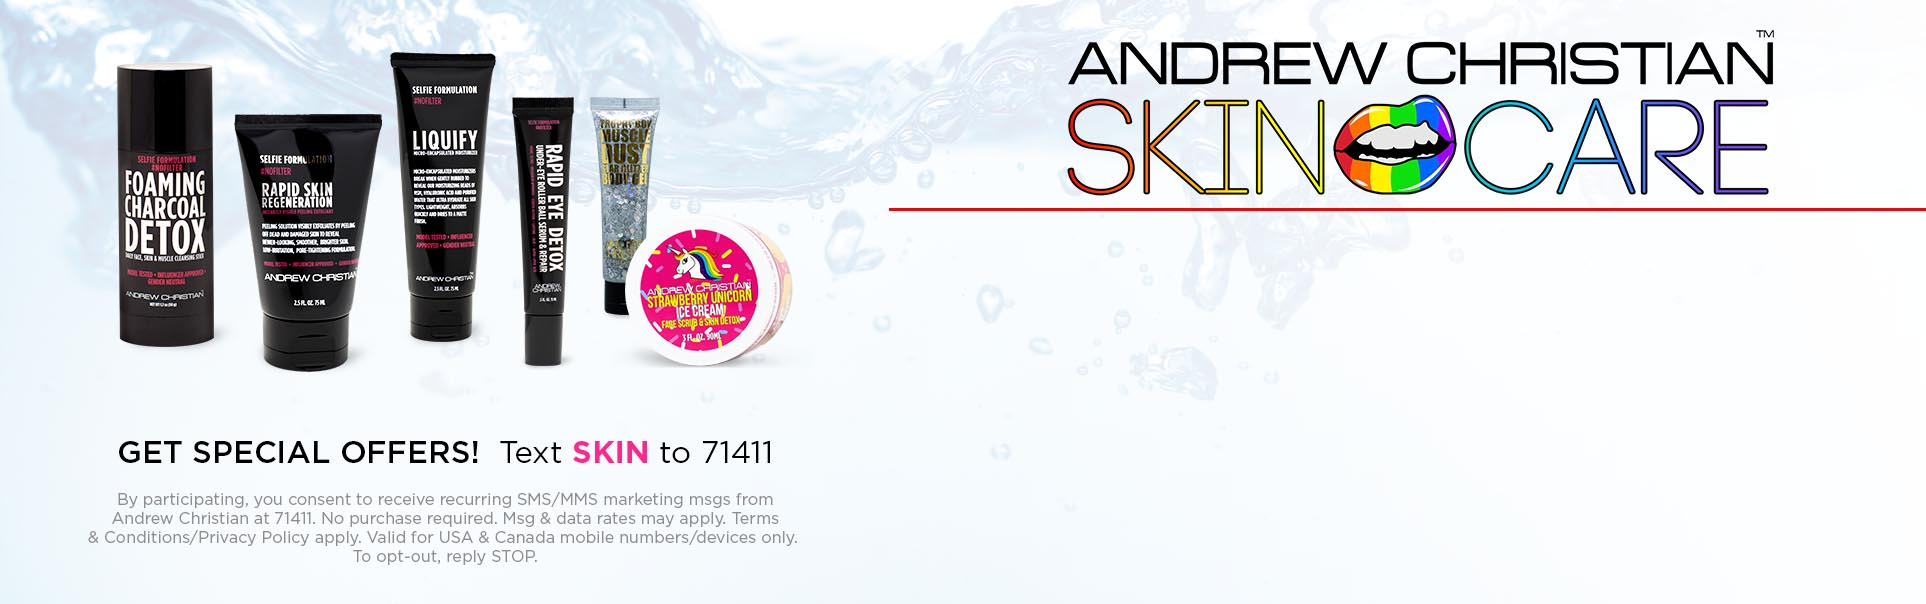 Skincare - NEW